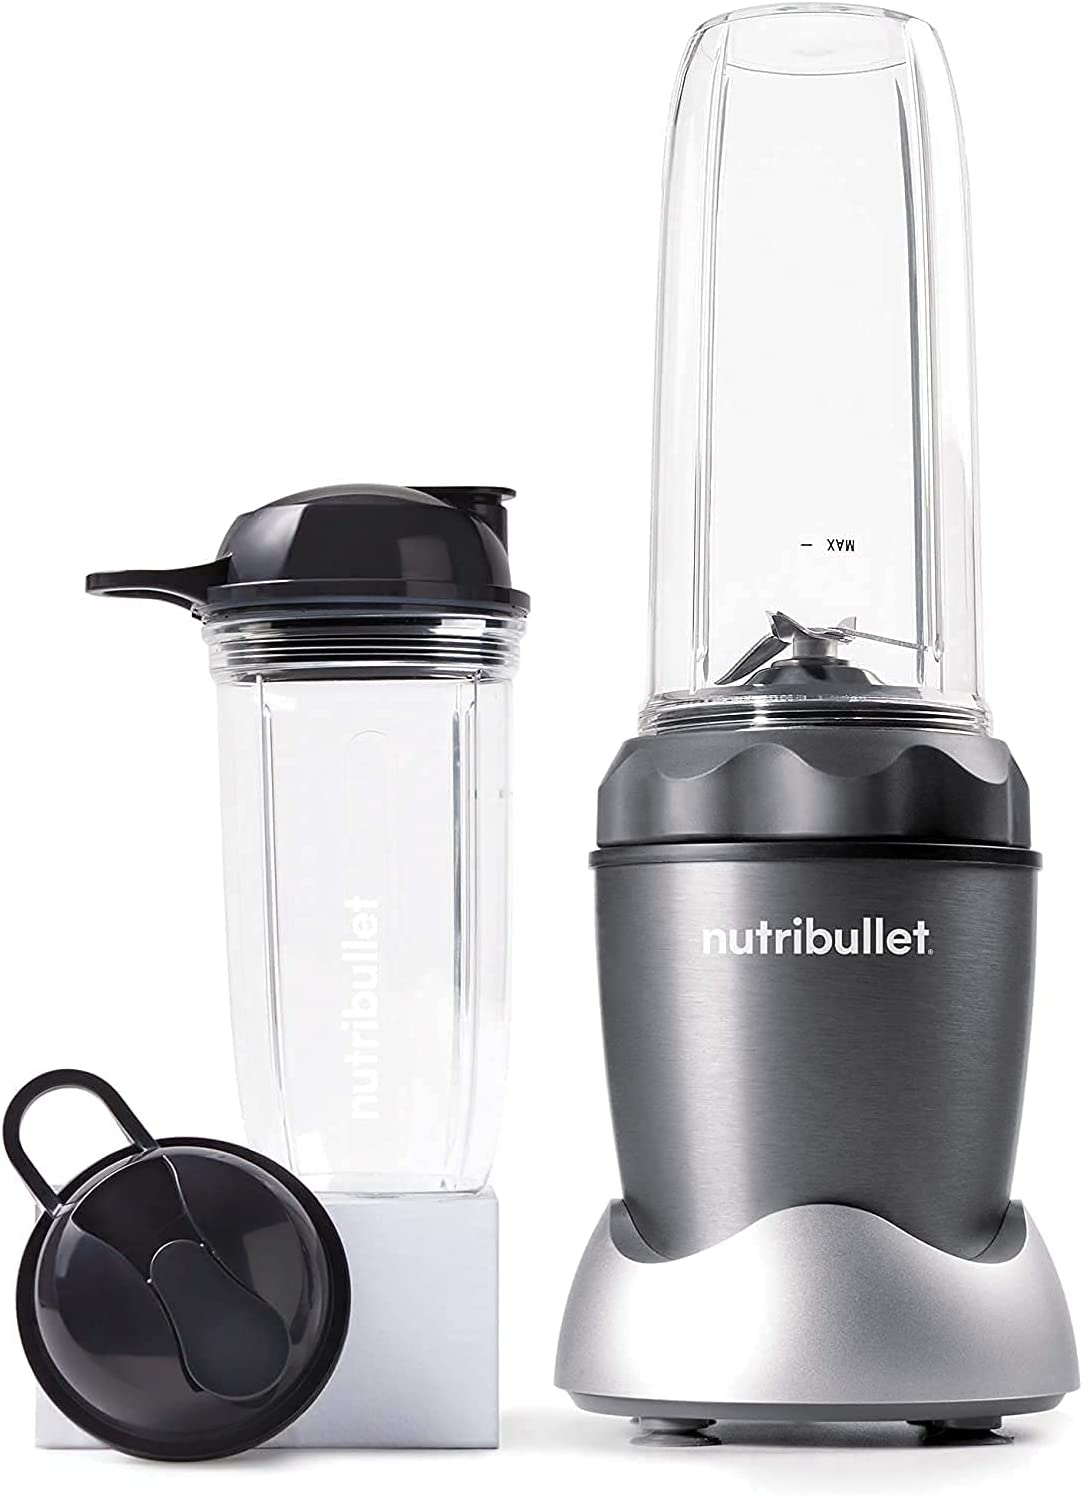 NutriBullet Pro 1000 Single Serve Blender Very Powerful 1000 Watts 7-Piece Set, Gray (Renewed)